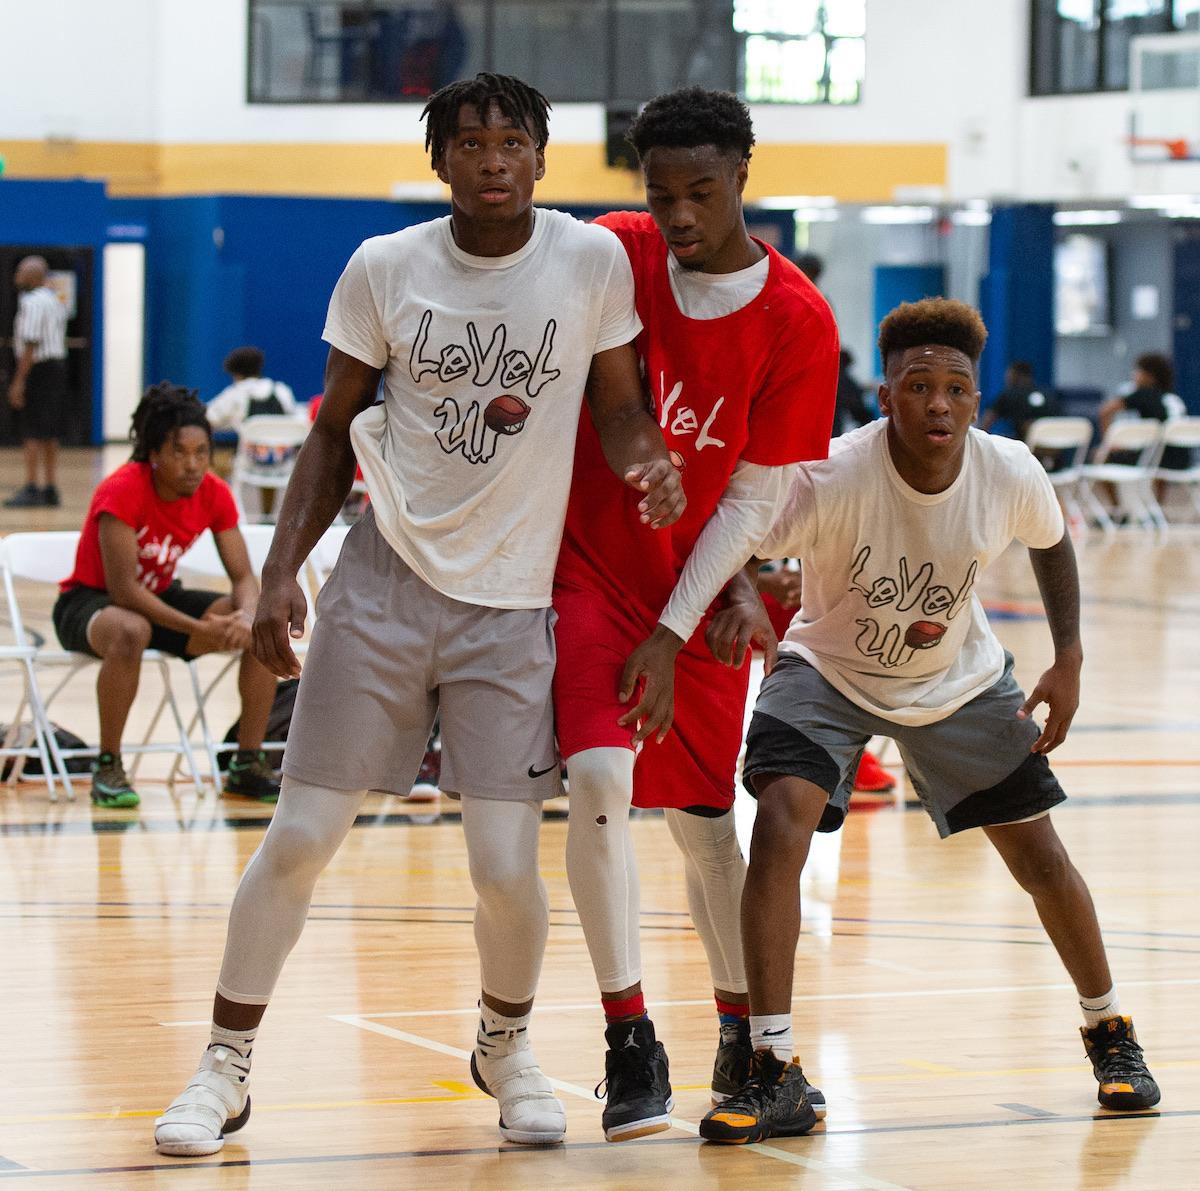 LeVeLUPTotrain-South-Florida-Basketball-Coaching-company